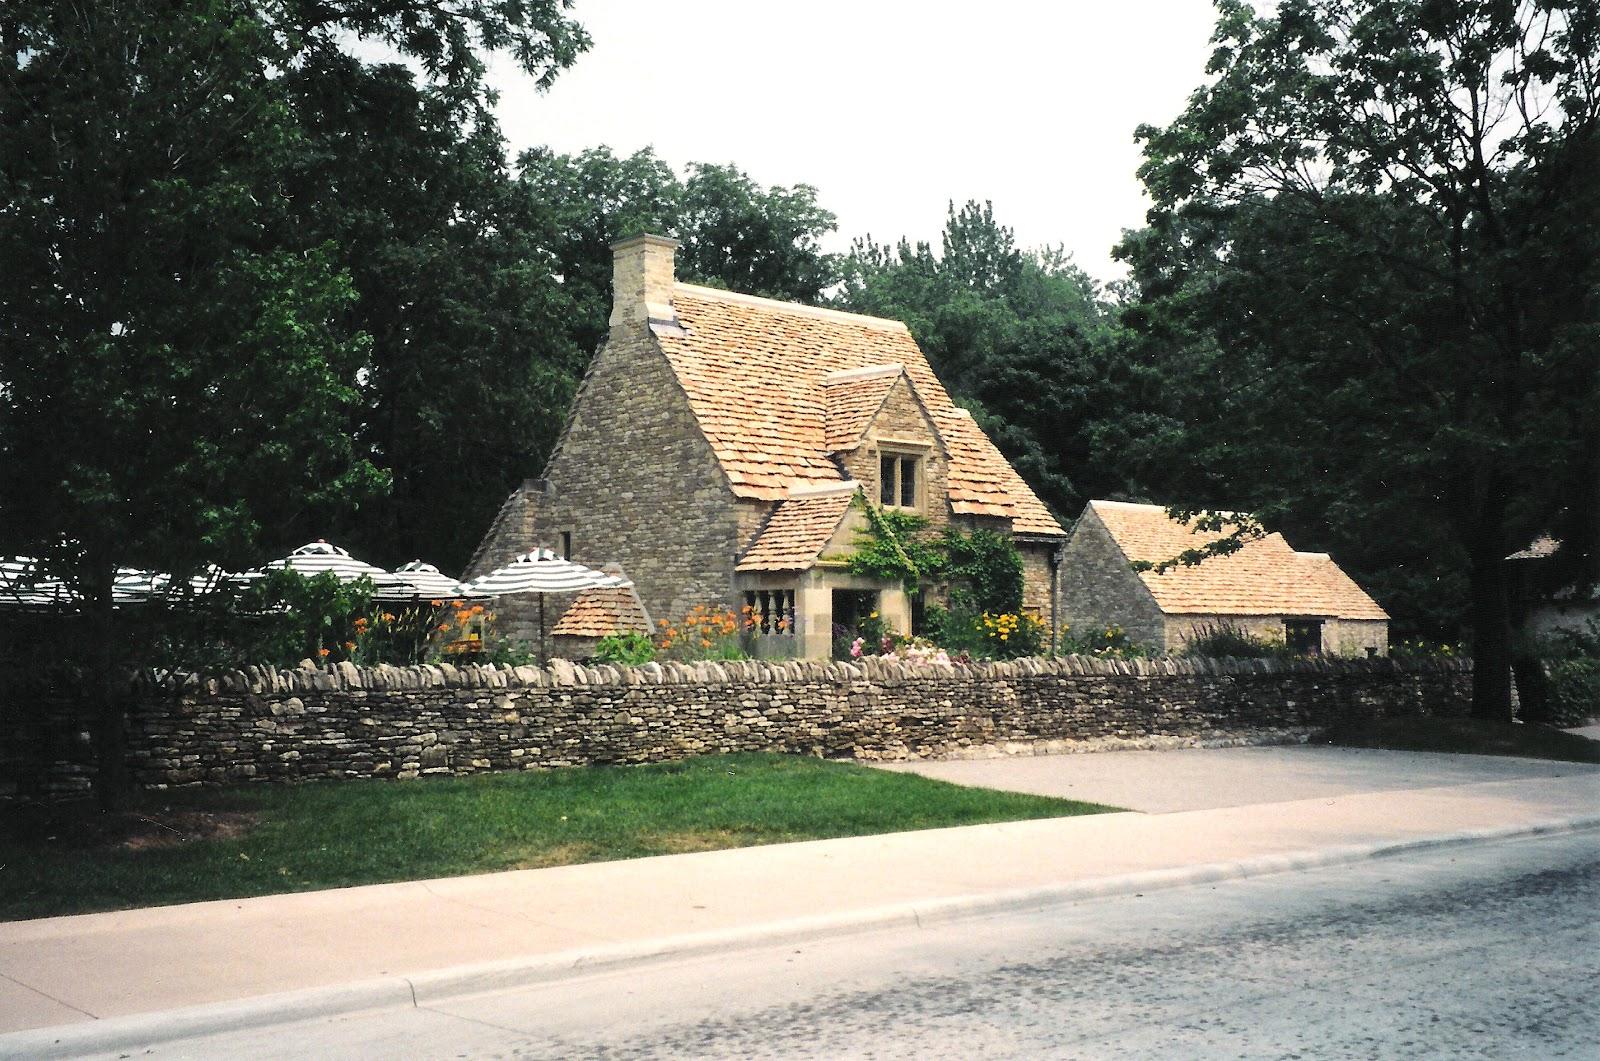 Benson Ford House Relevant Tea Leaf July 2012